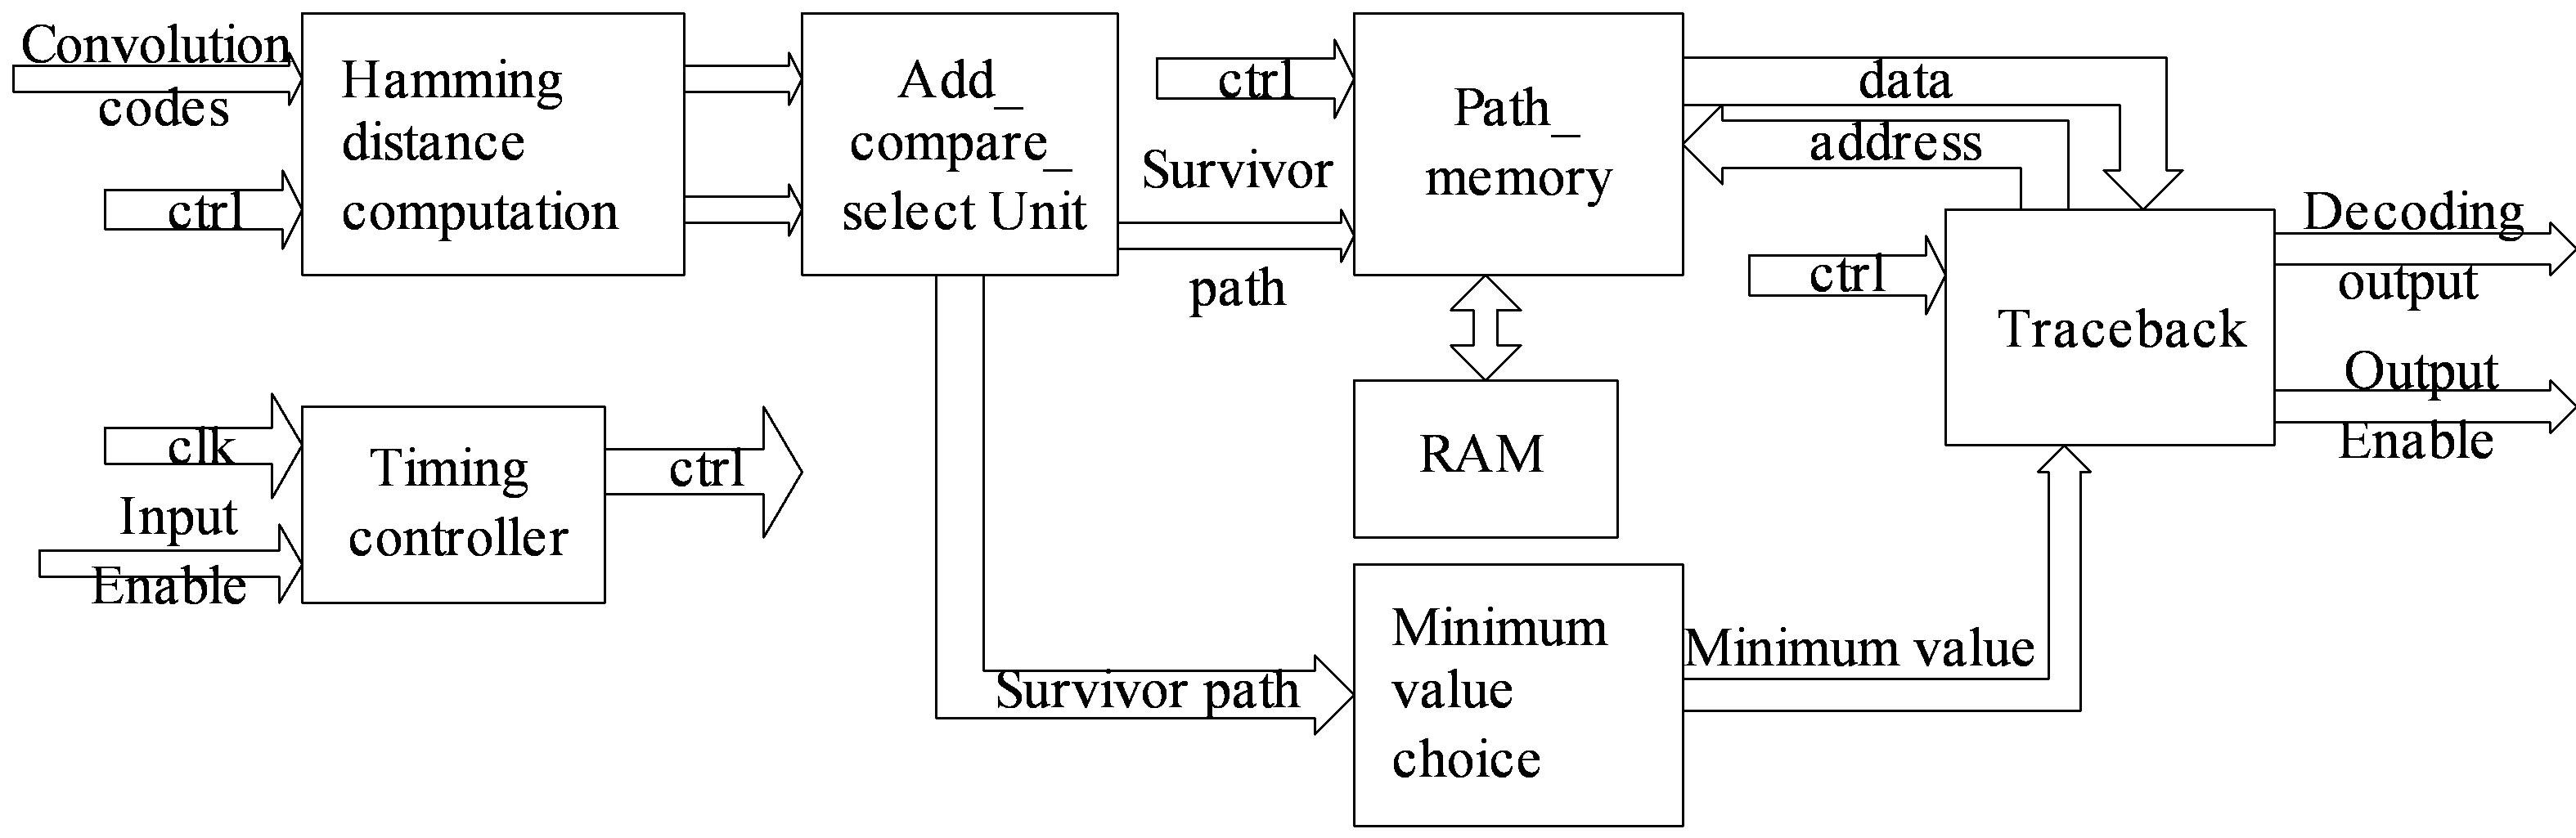 fpga design and implementation of a convolutional encoder and a rh file scirp org Viterbi Algorithm Matlab Viterbi Algorithm Example